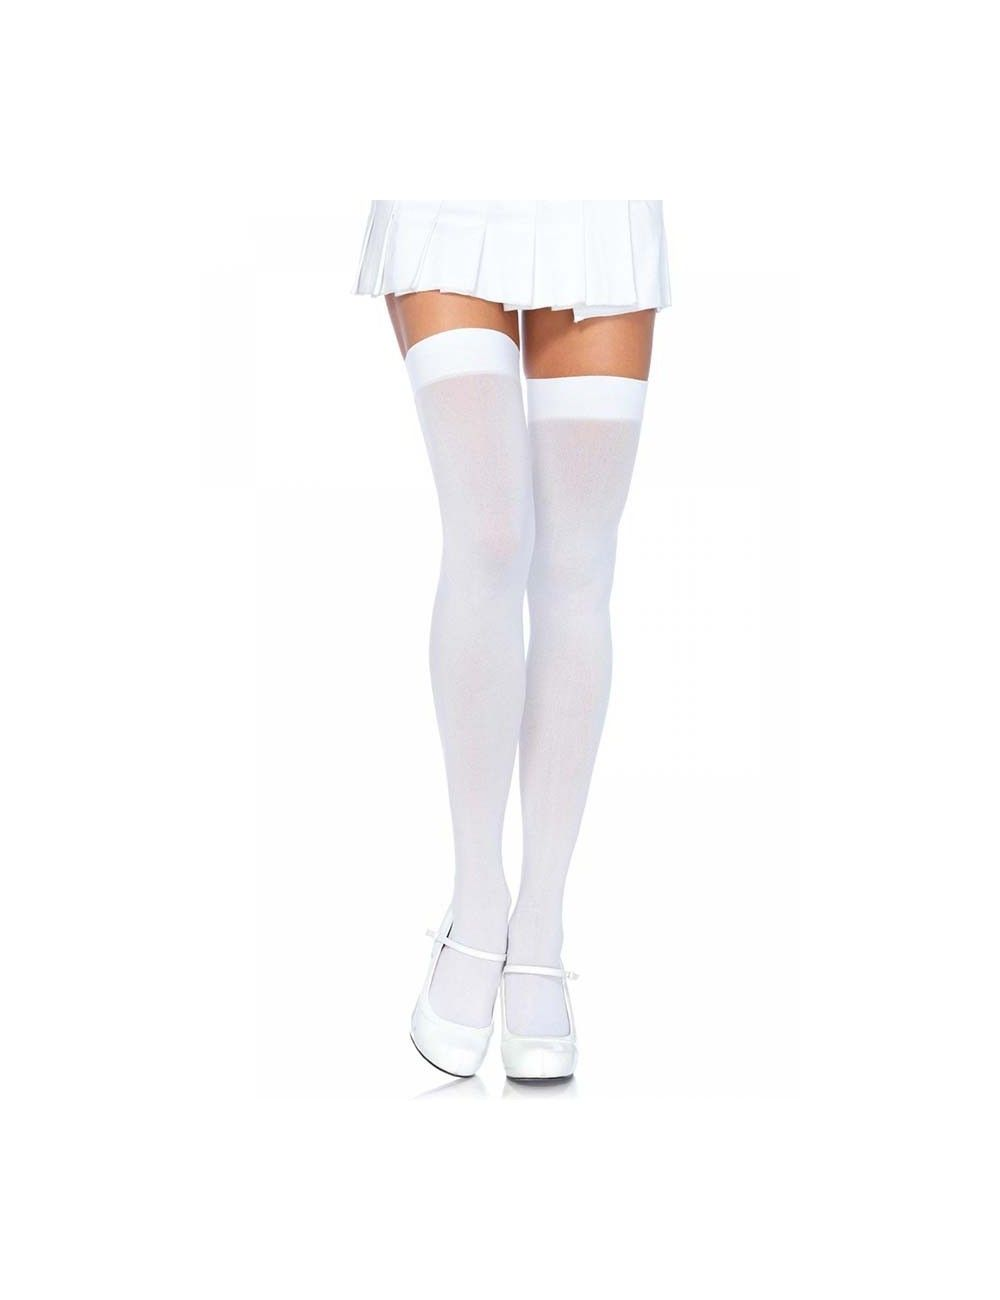 Bas opaques blanc en nylon Leg Avenue